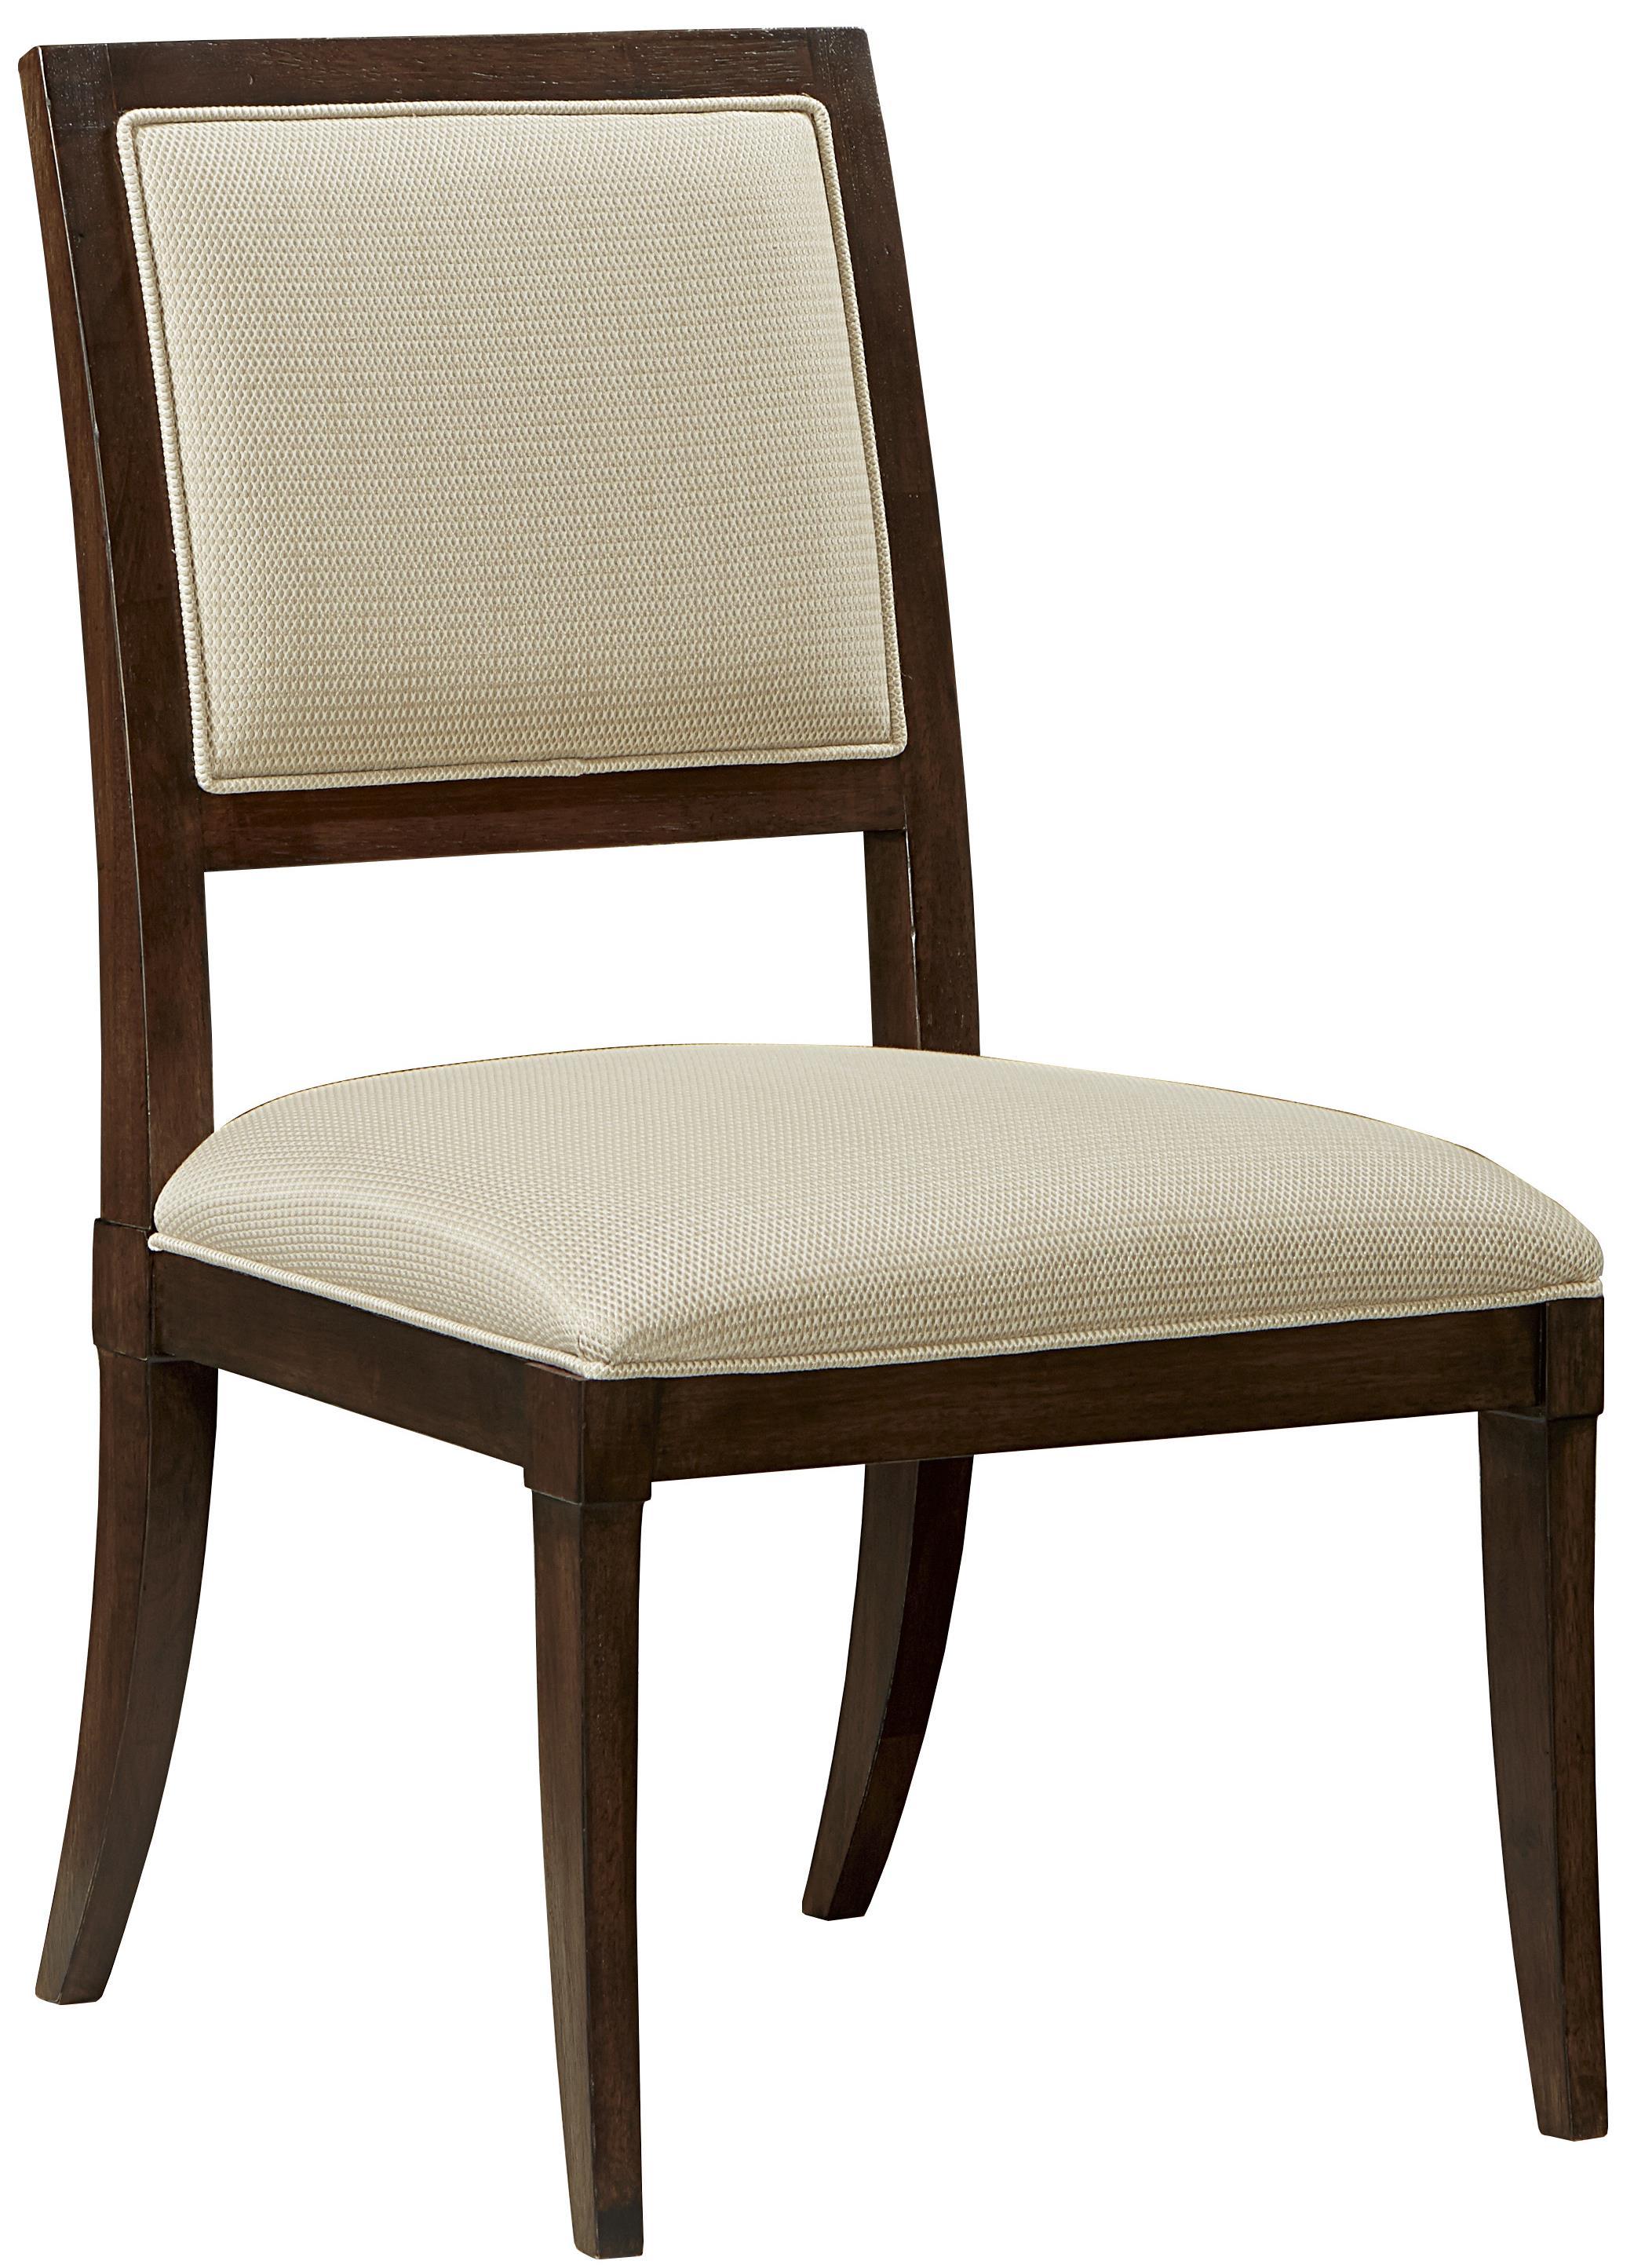 Fine Furniture Design Textures 1560-822 Ellis Side Chair